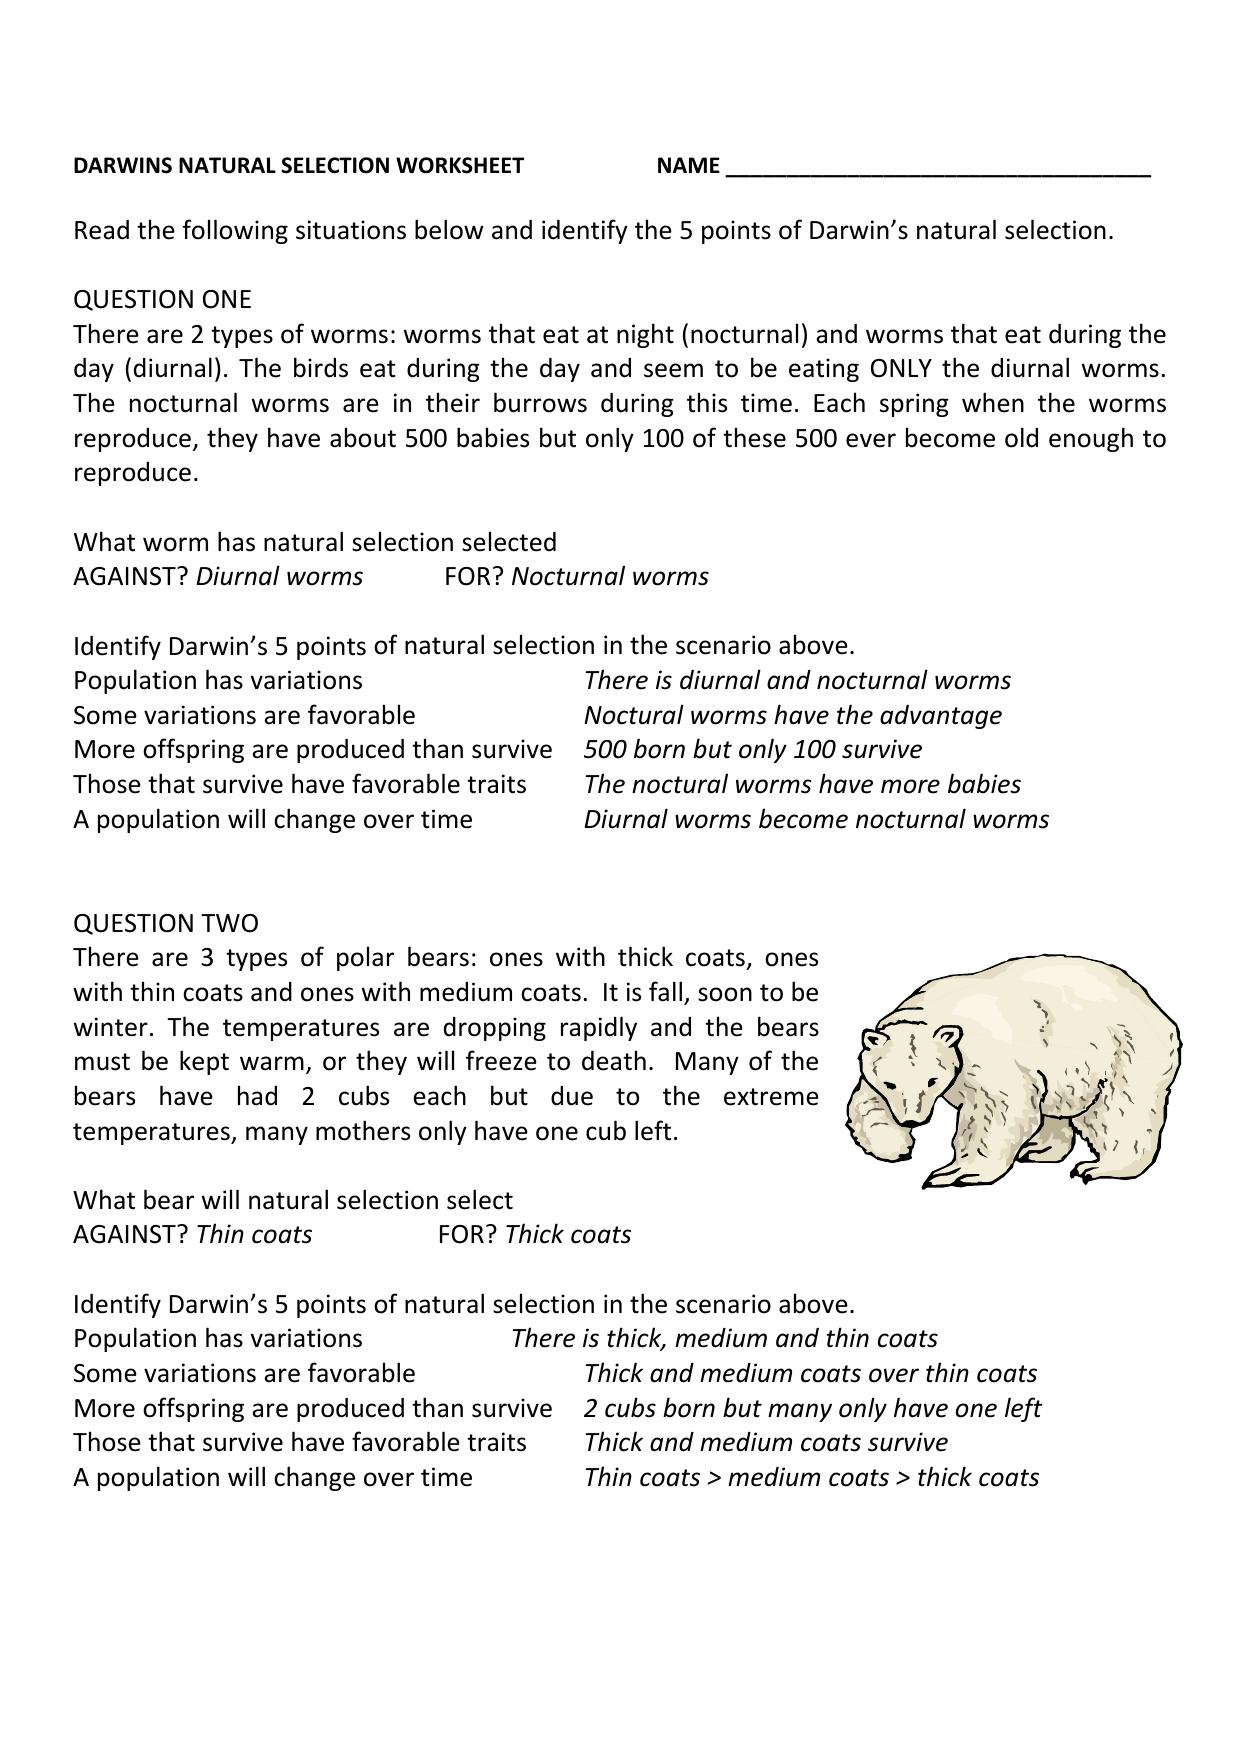 303207517 darwins natural selection worksheet key